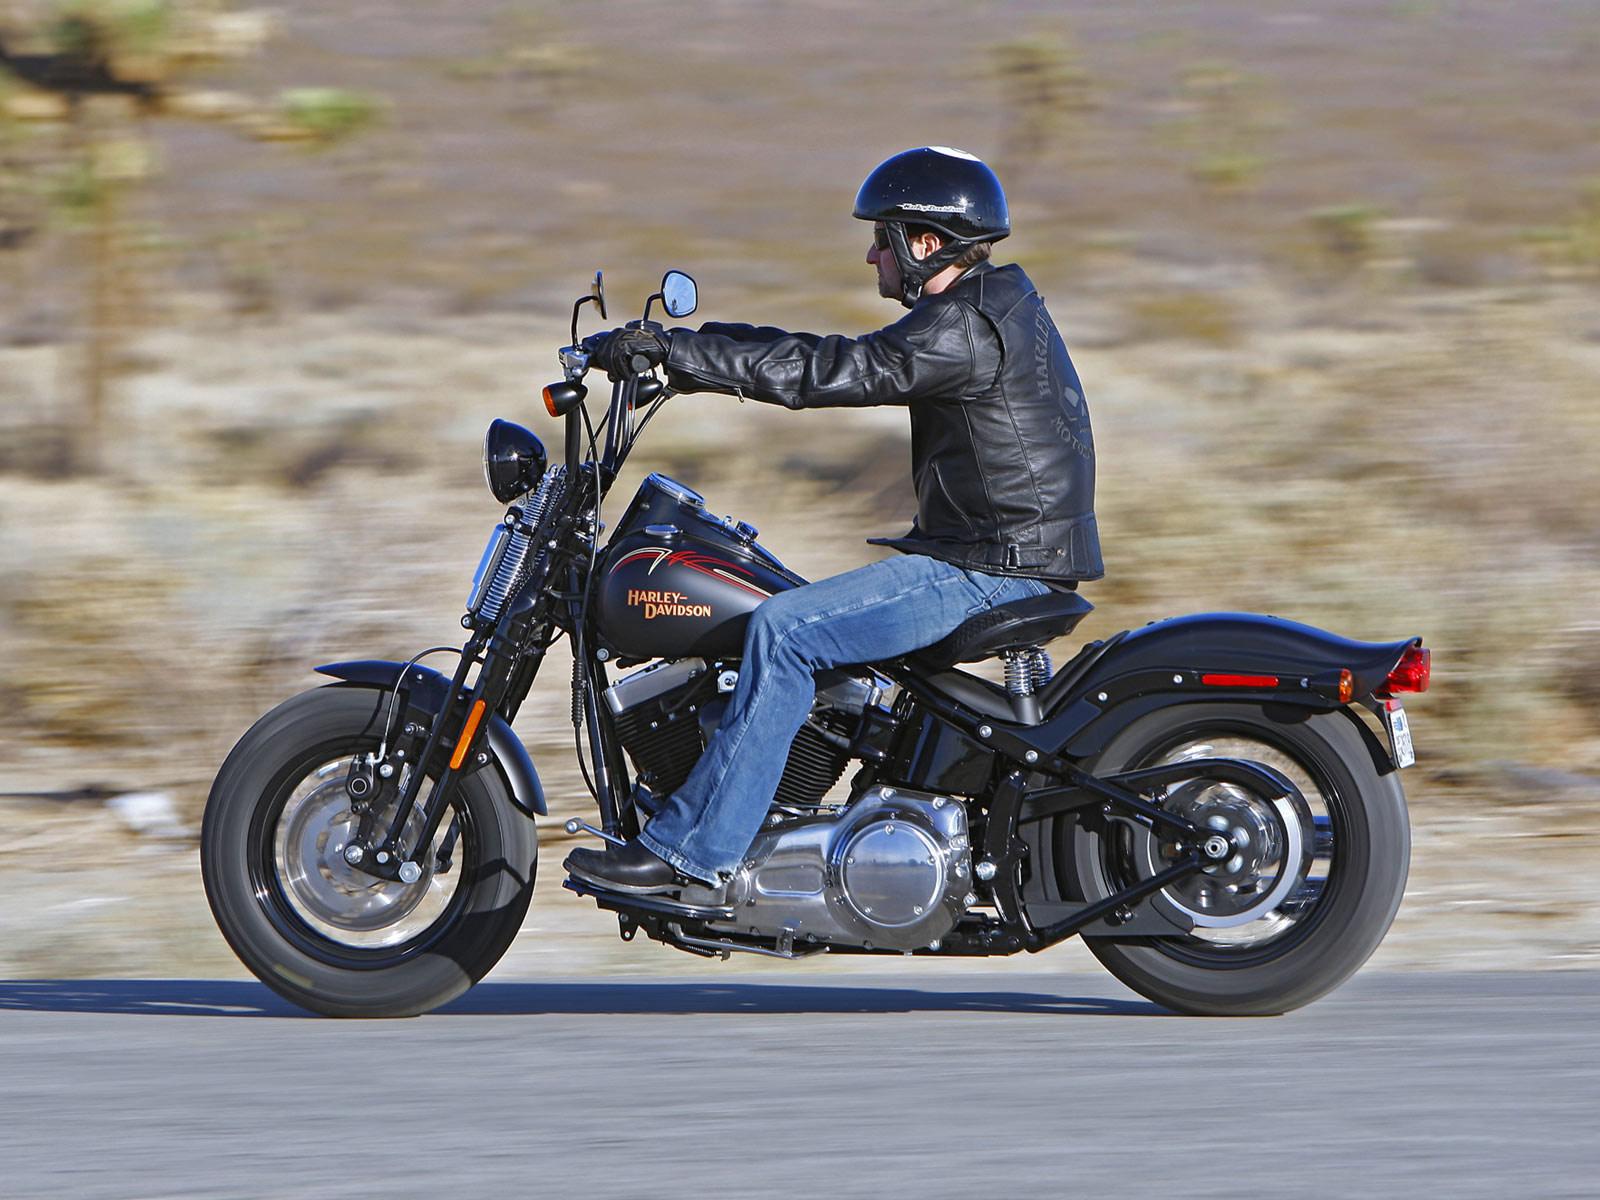 Harley Davidson Softail: Harley-Davidson Pictures. 2008 FLSTB Softail Cross Bones